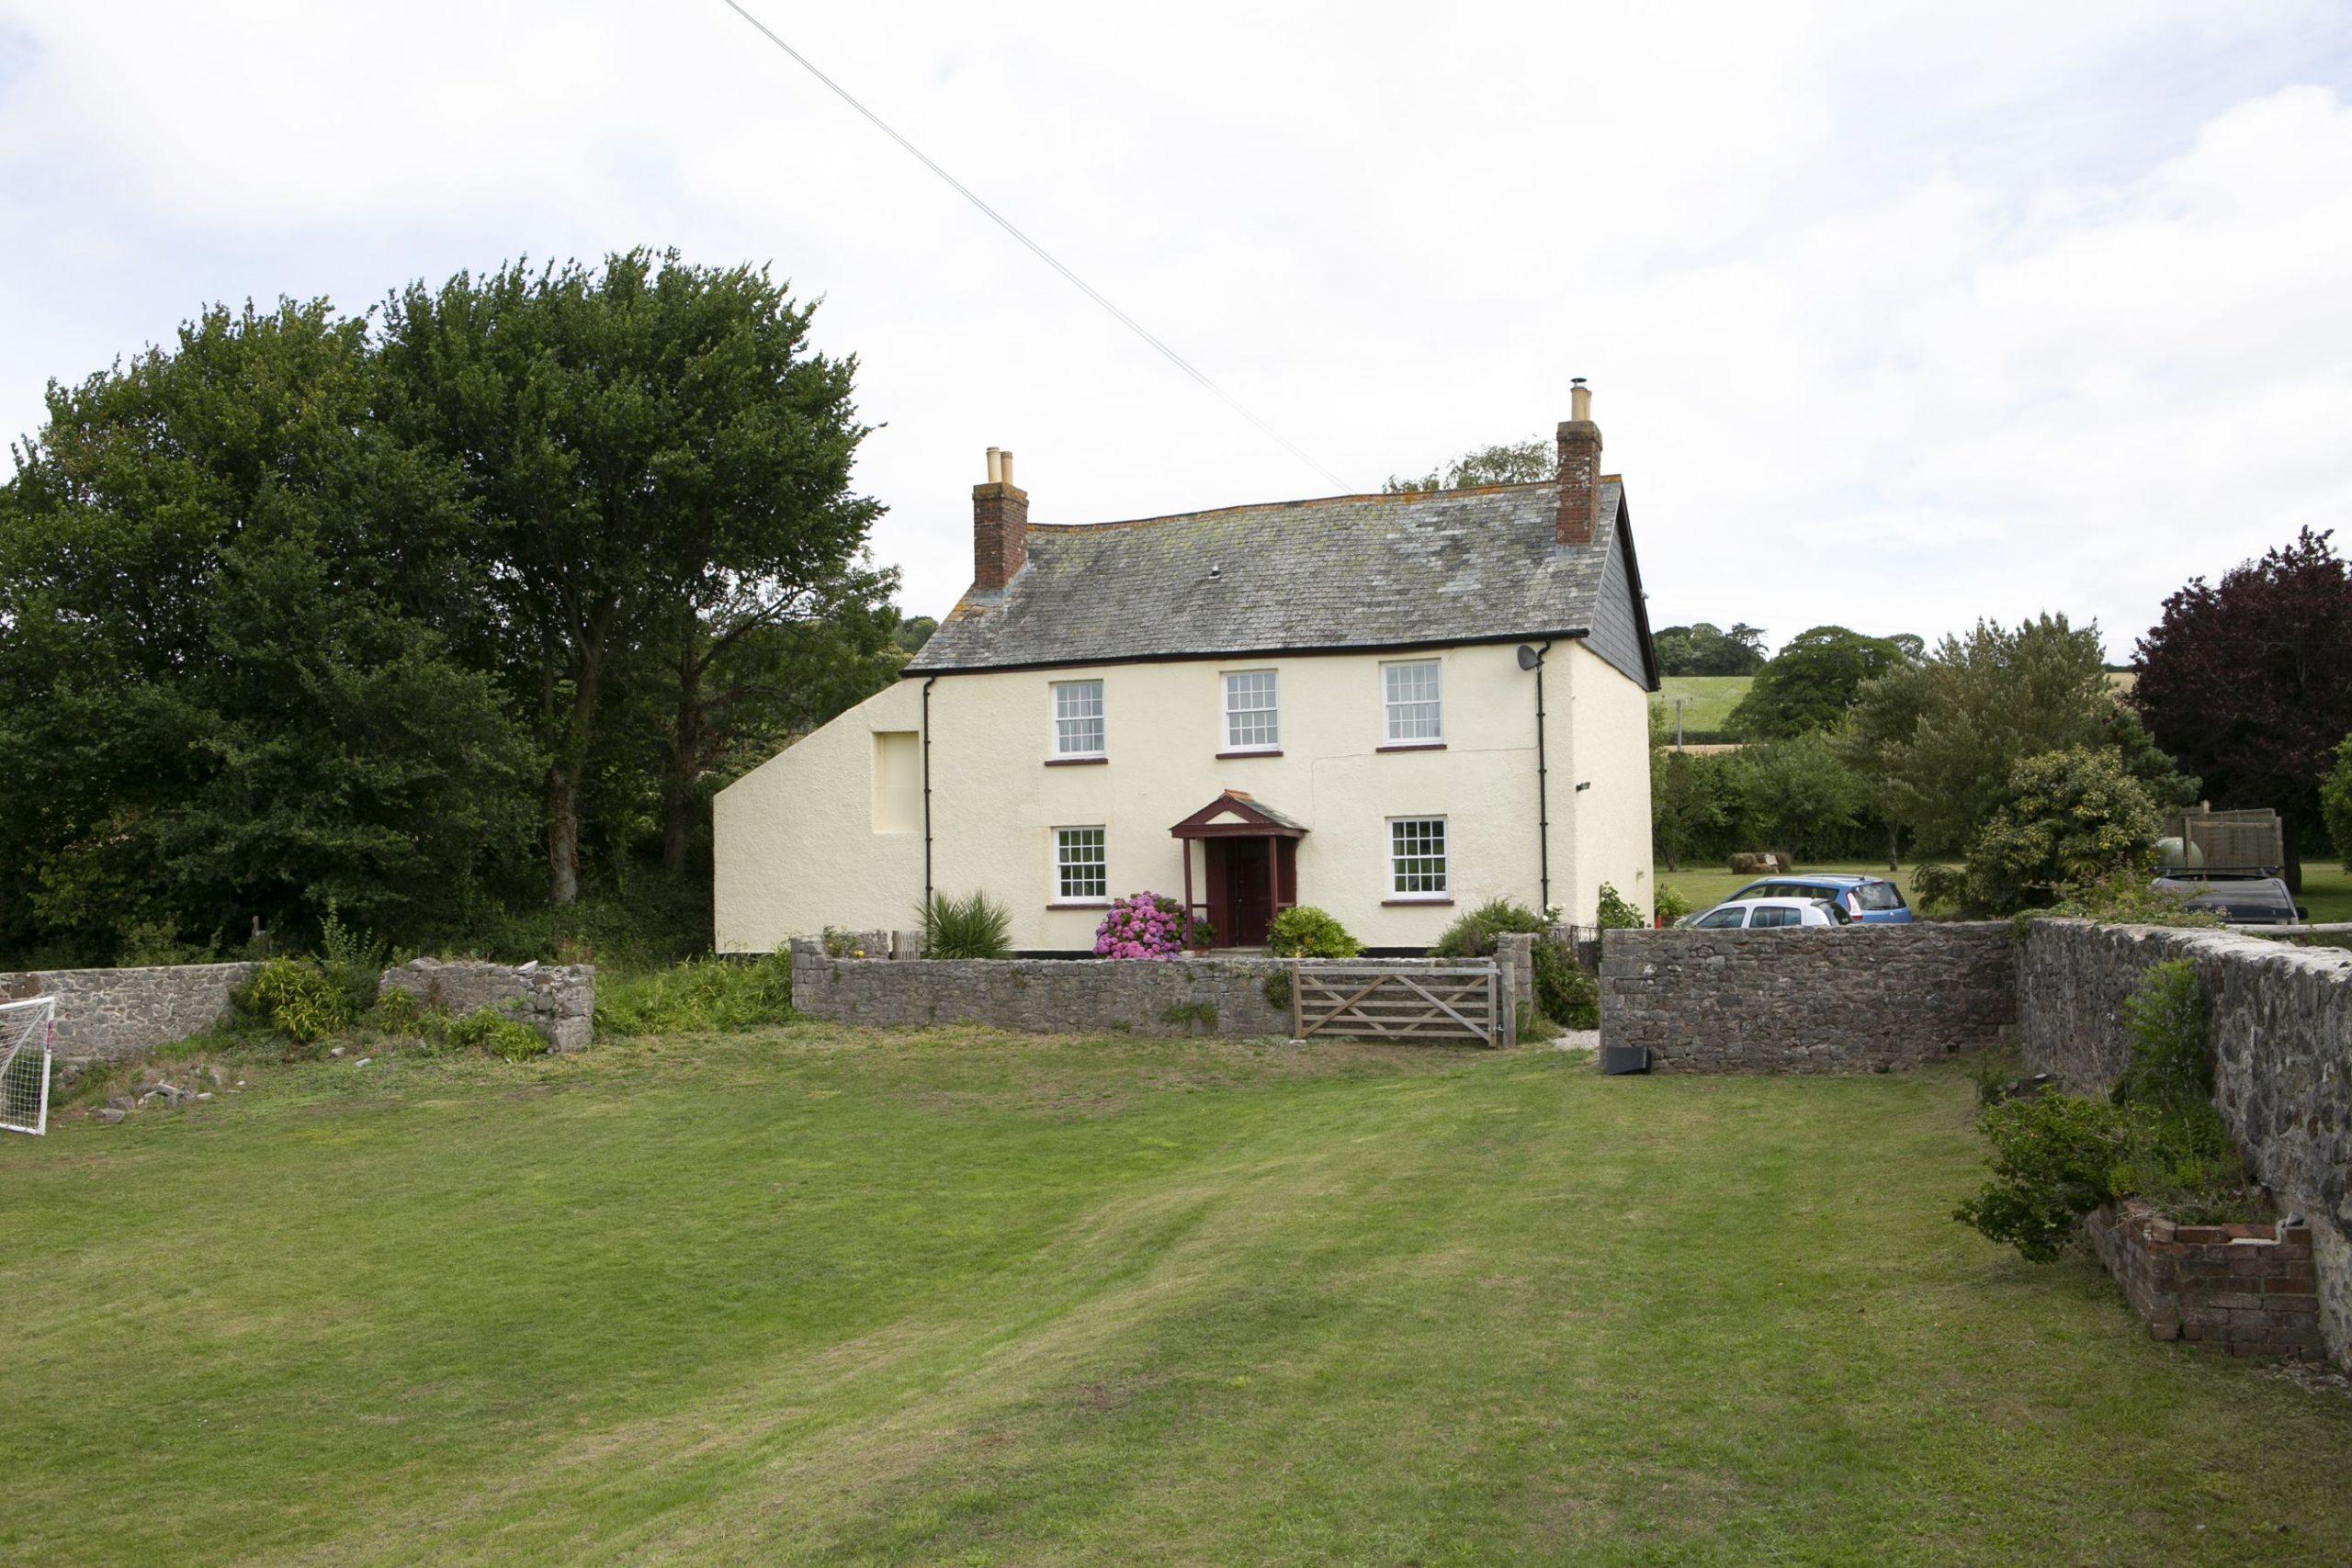 Vennbridge Farm